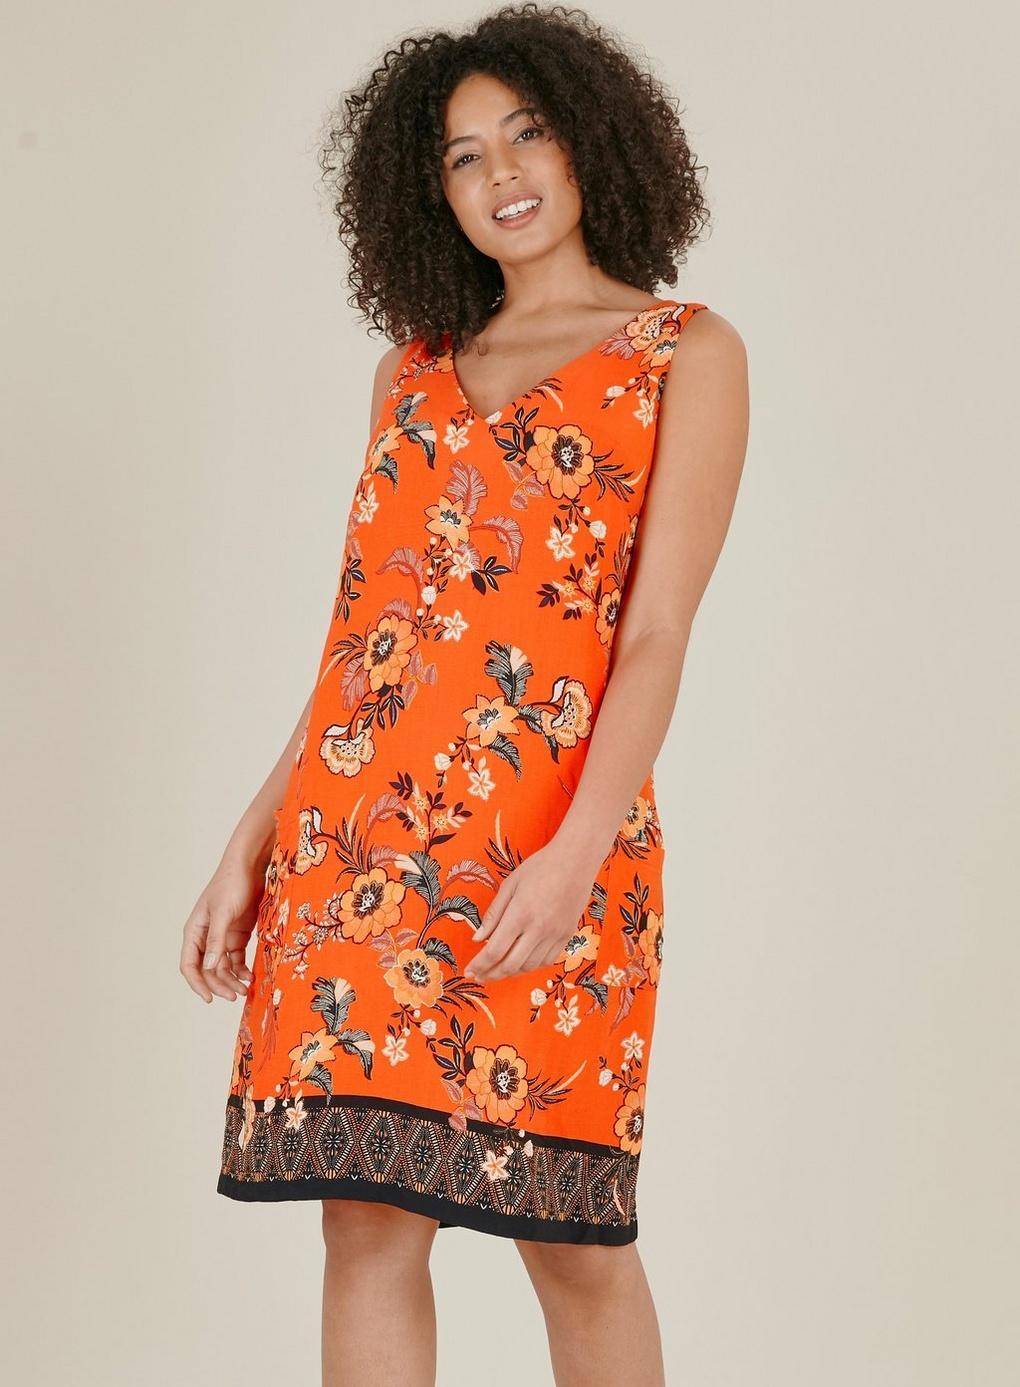 6dd46e25b44b6 Evans - Orange Floral Print Pinafore Dress - Lyst. View fullscreen